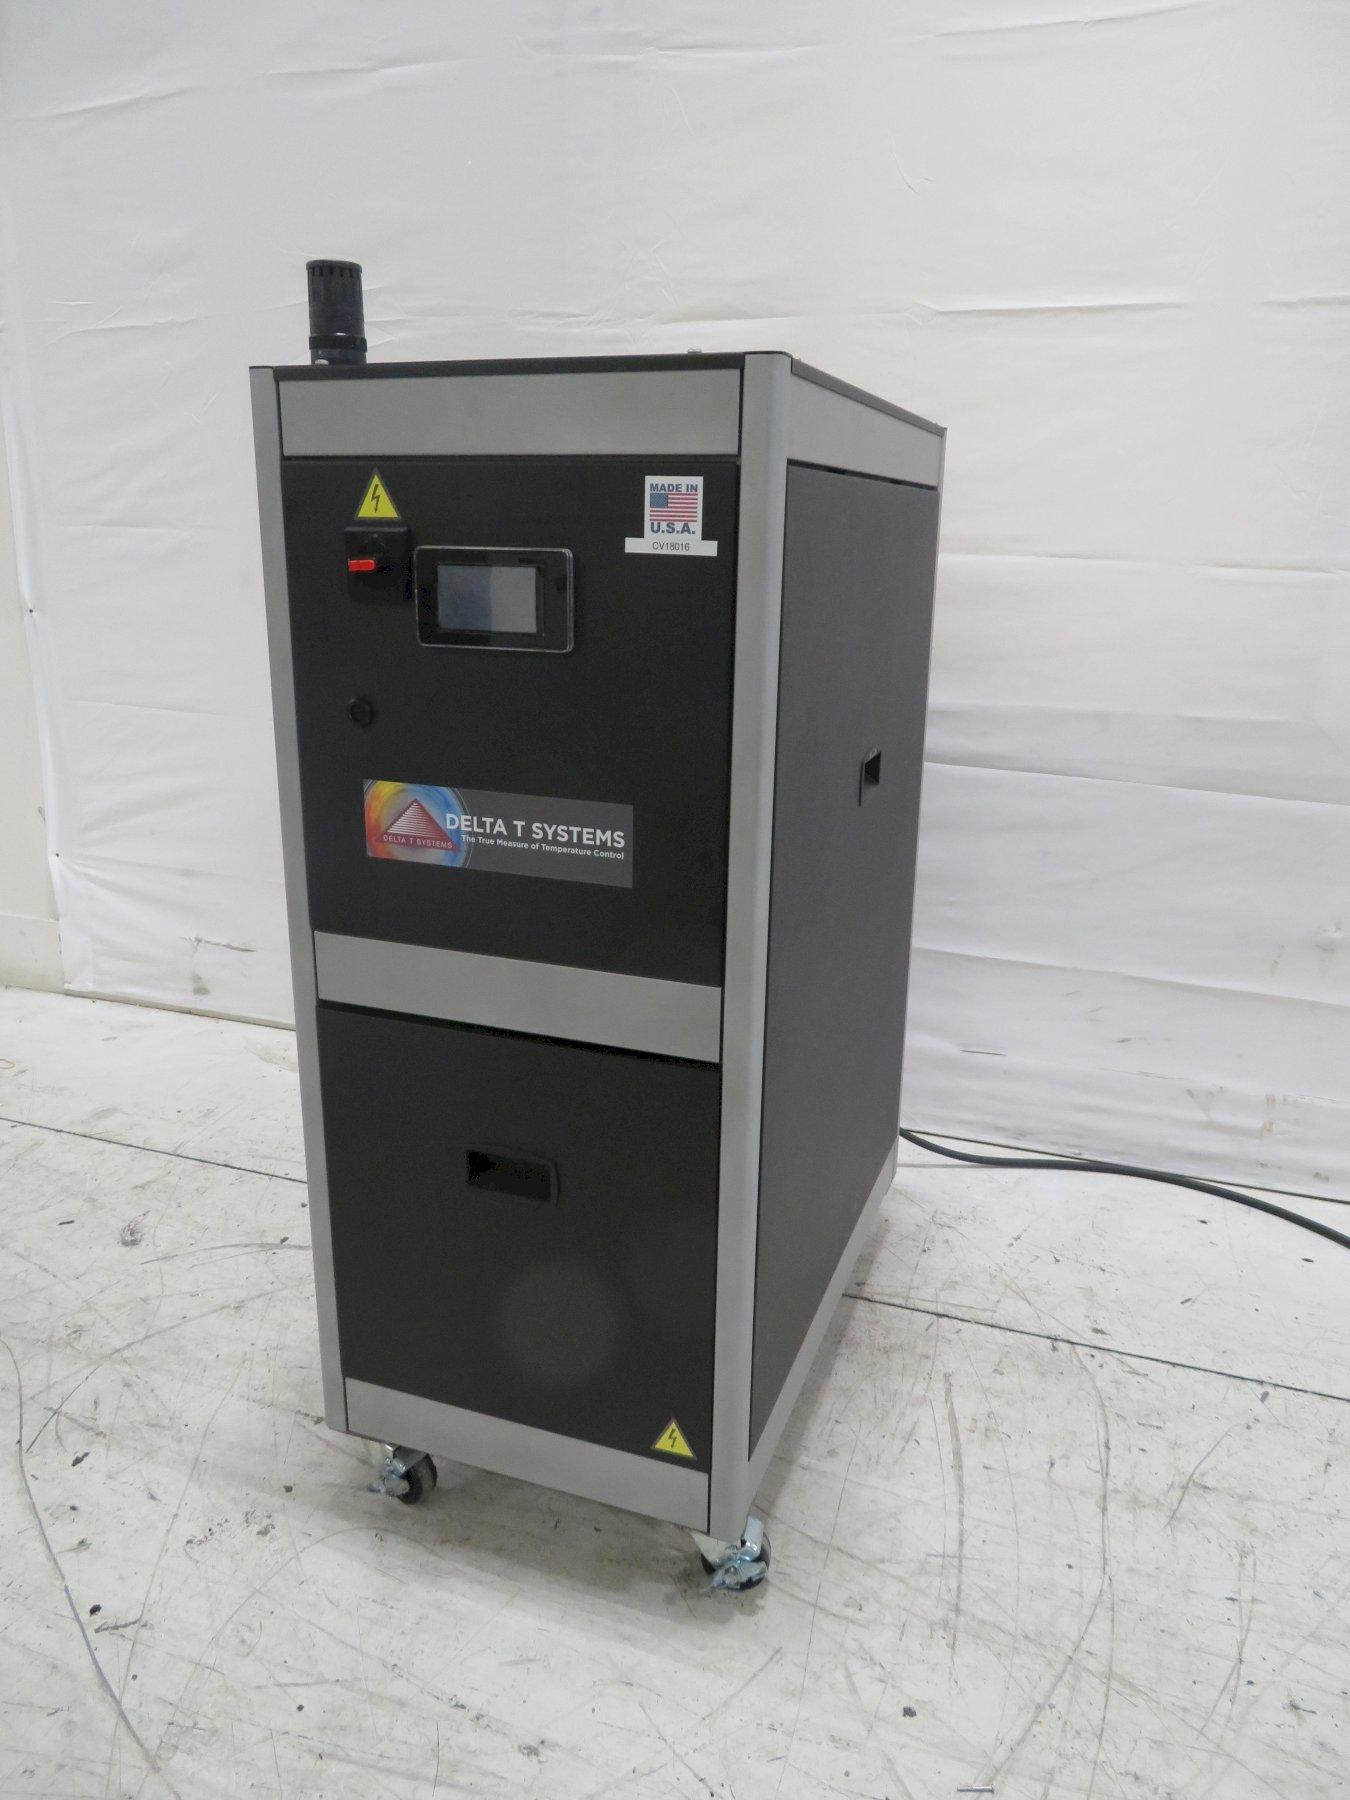 Delta T Used VSP-003 Portable Water Chiller, 4.3 ton, 1hp, 230V, Yr. 2017